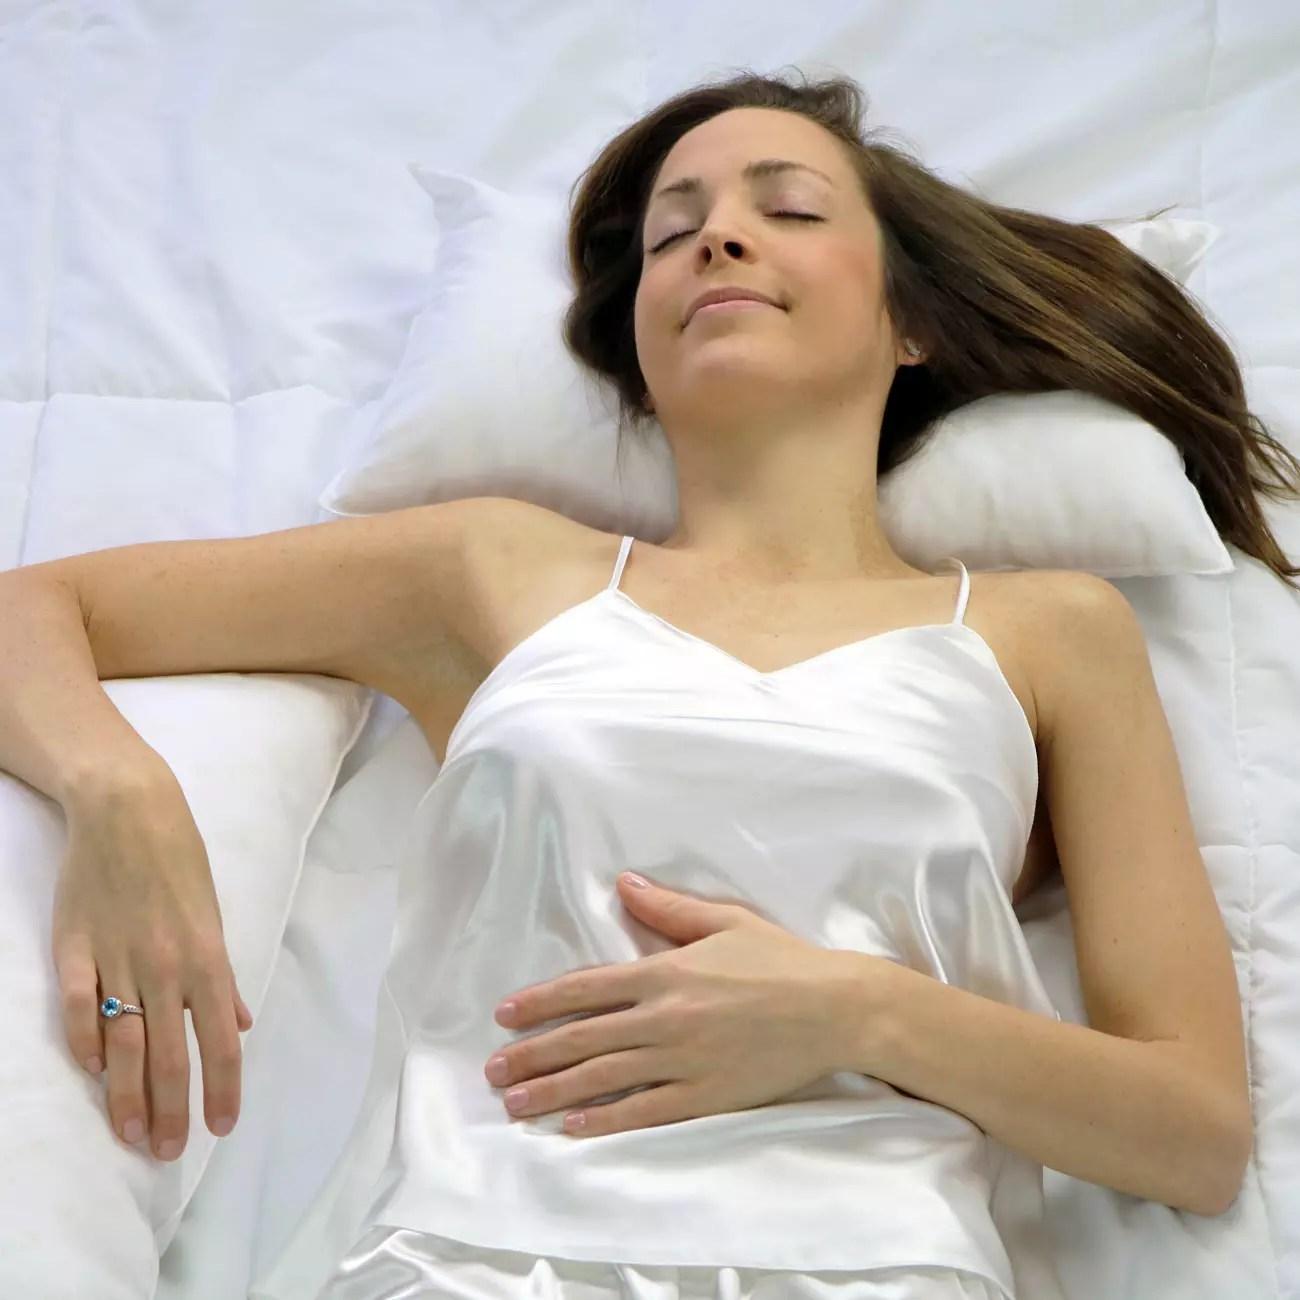 neck pillow knee pillow back pillow